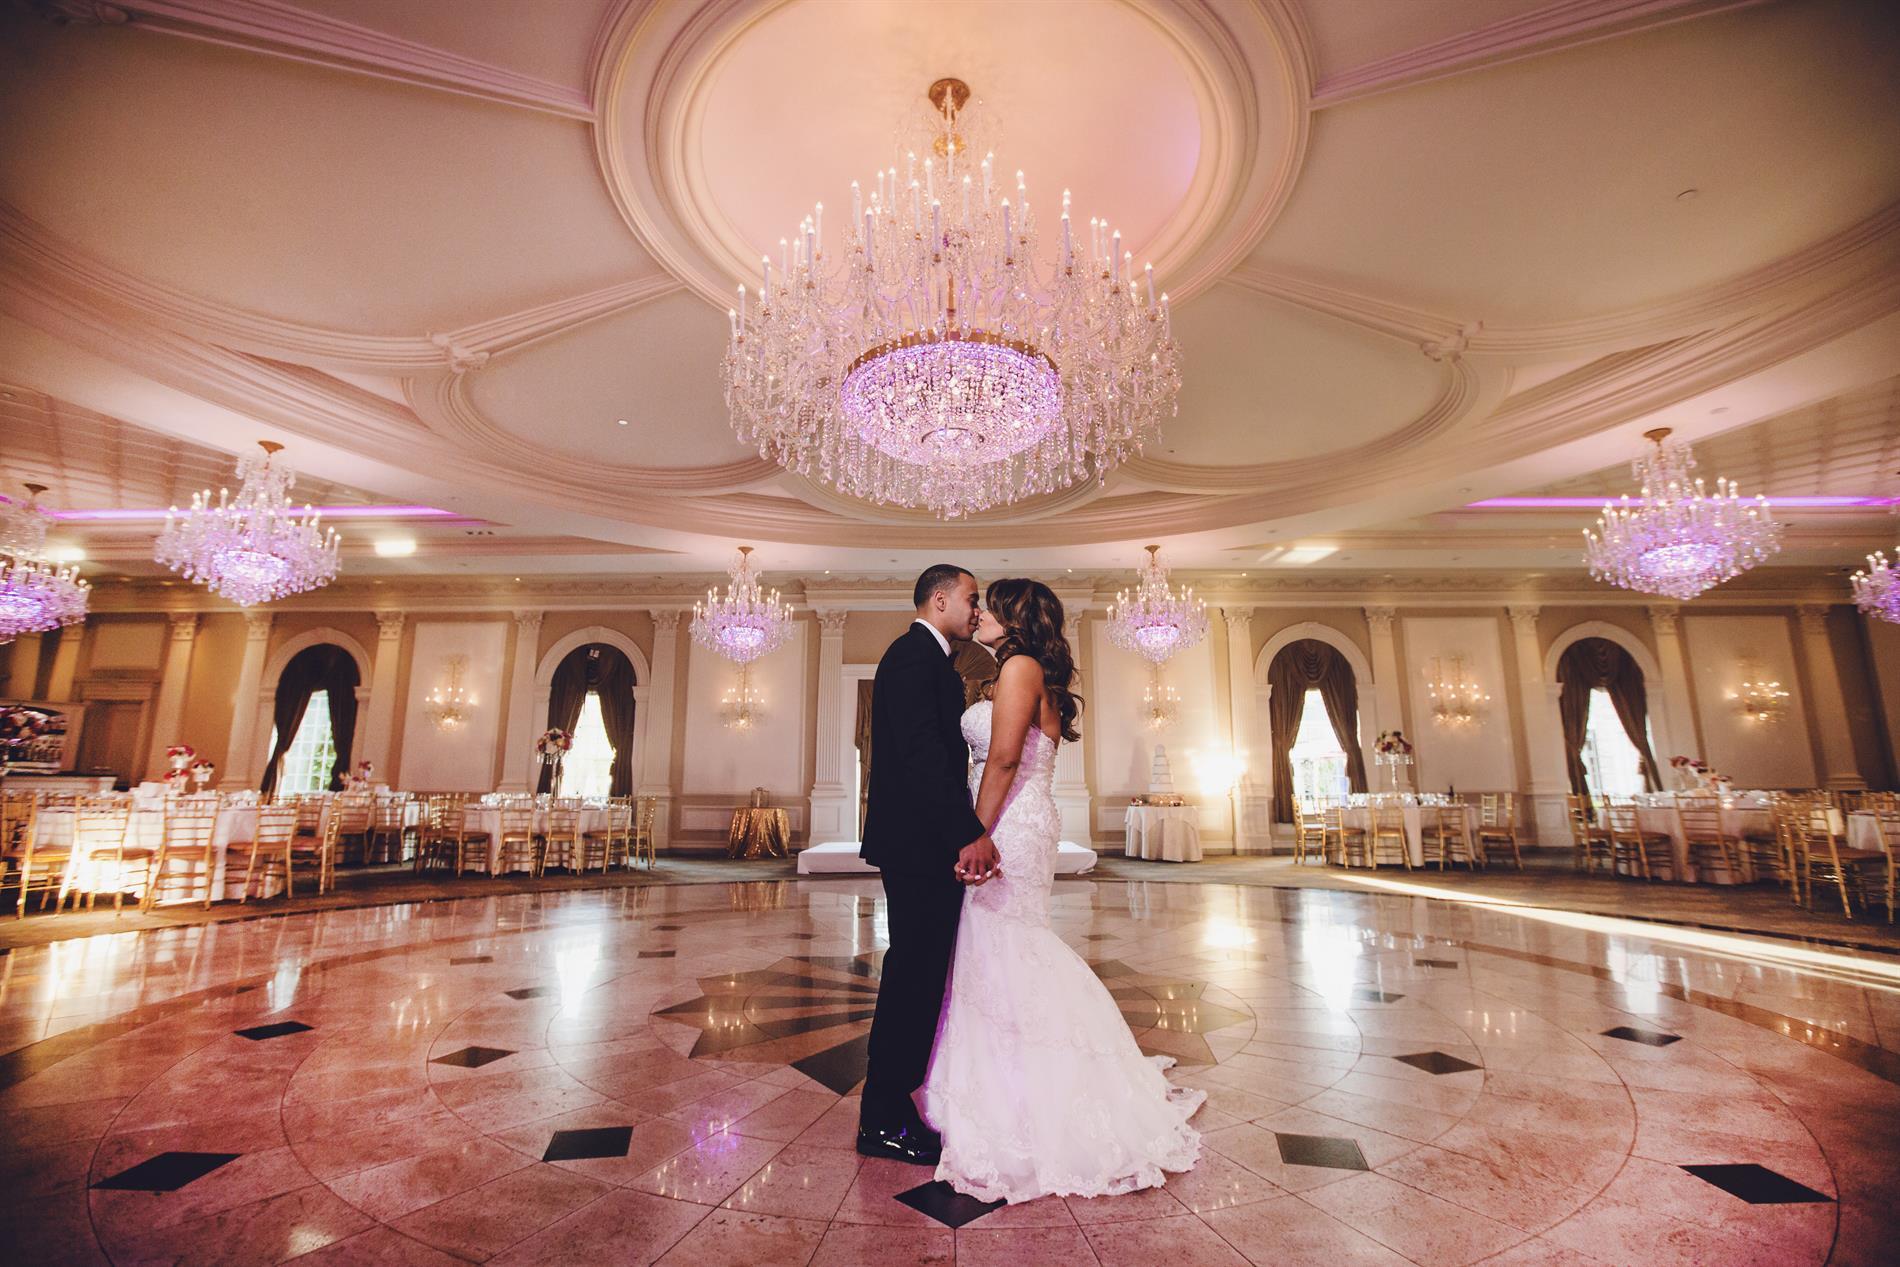 Peter & Mariam Wedding Photos